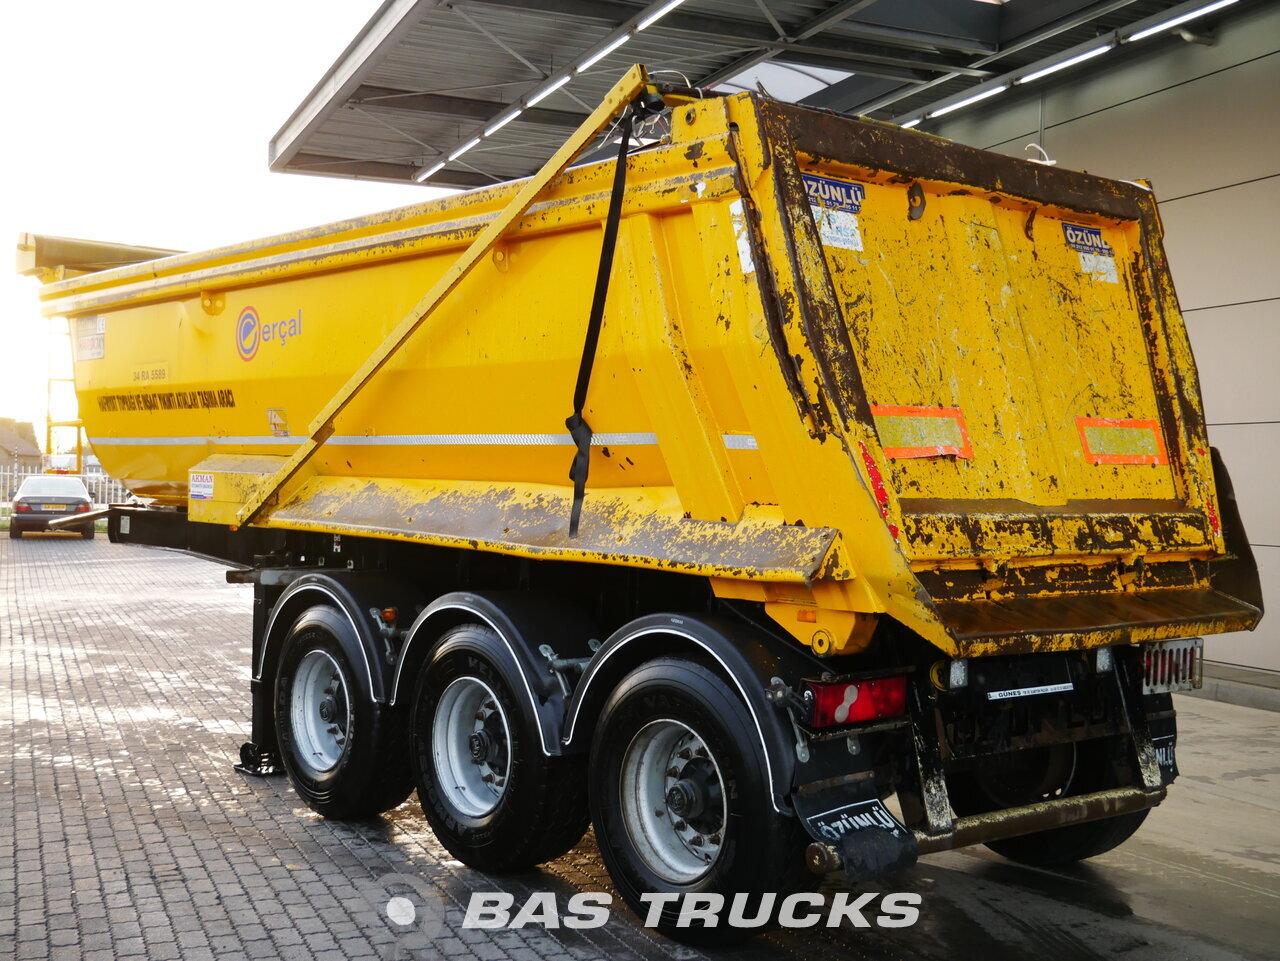 foto di Usato Semirimorchio Ozunlu 23m3 Stahl kipper BPW 2x Liftachse ZK1 assi 2016